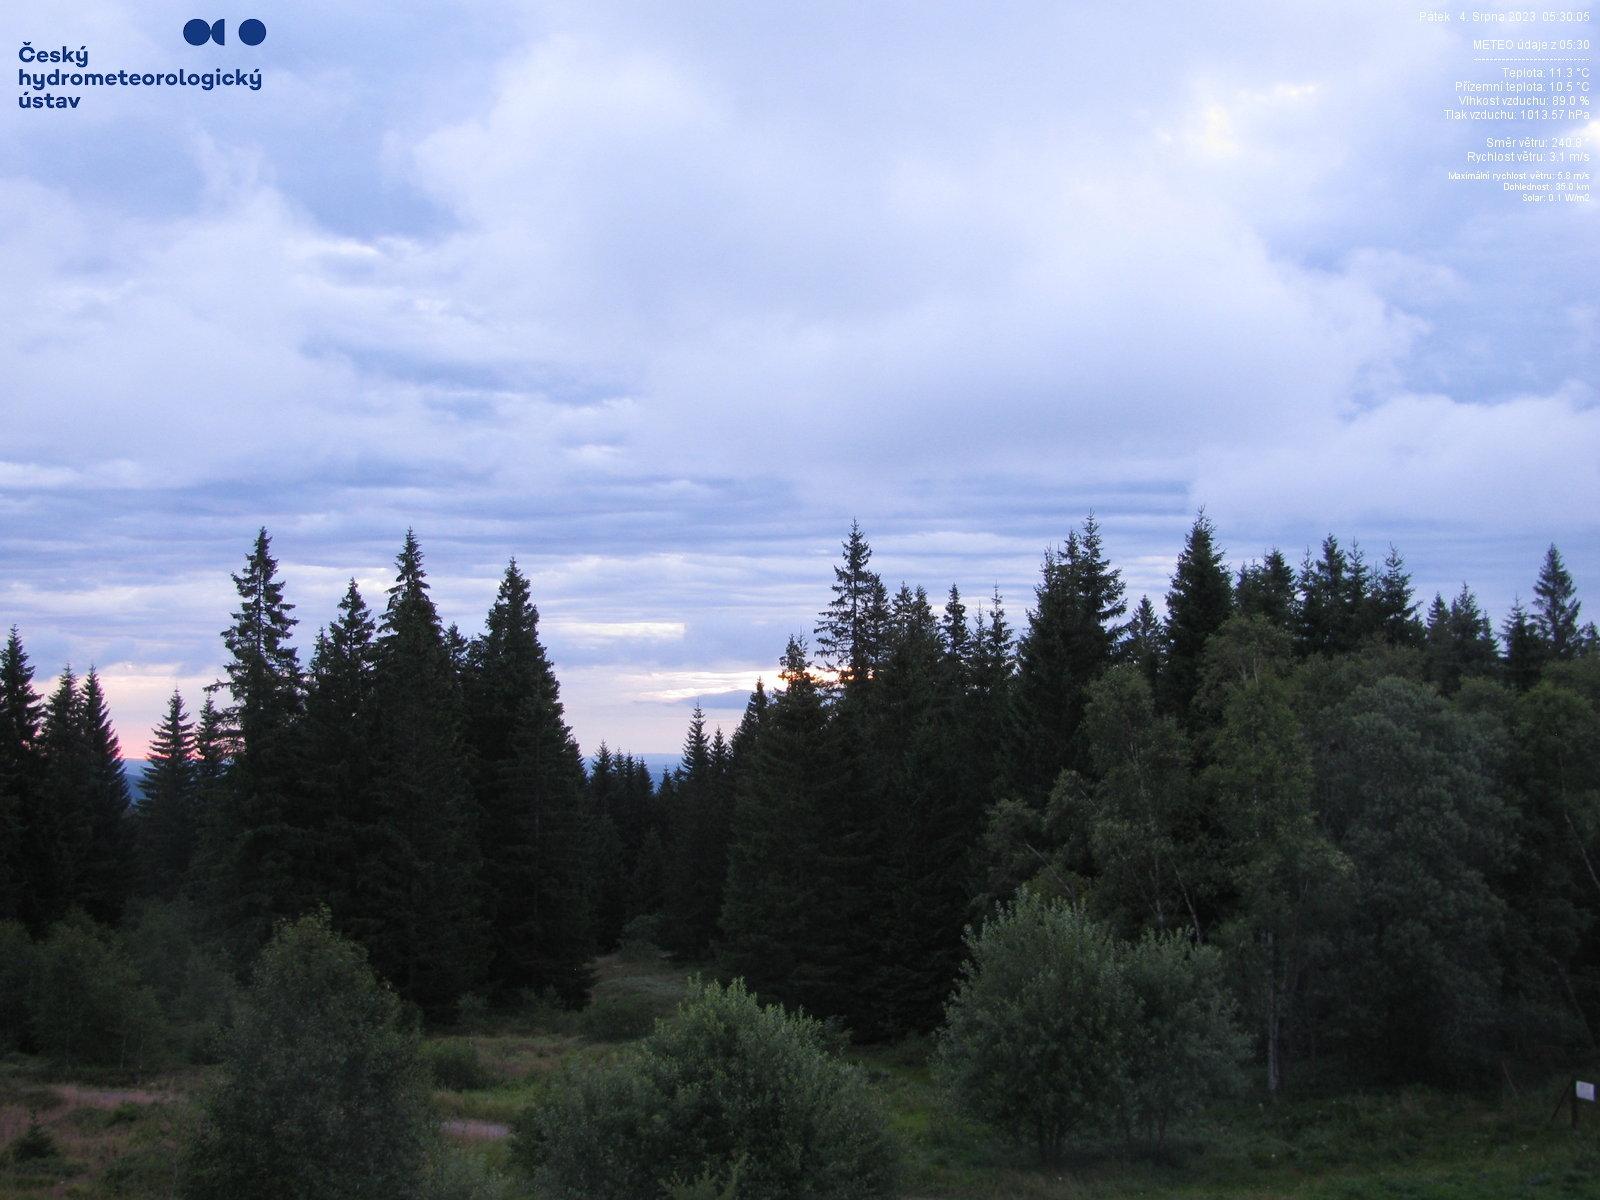 http://www.chmi.cz/files/portal/docs/meteo/kam/churanov.jpg